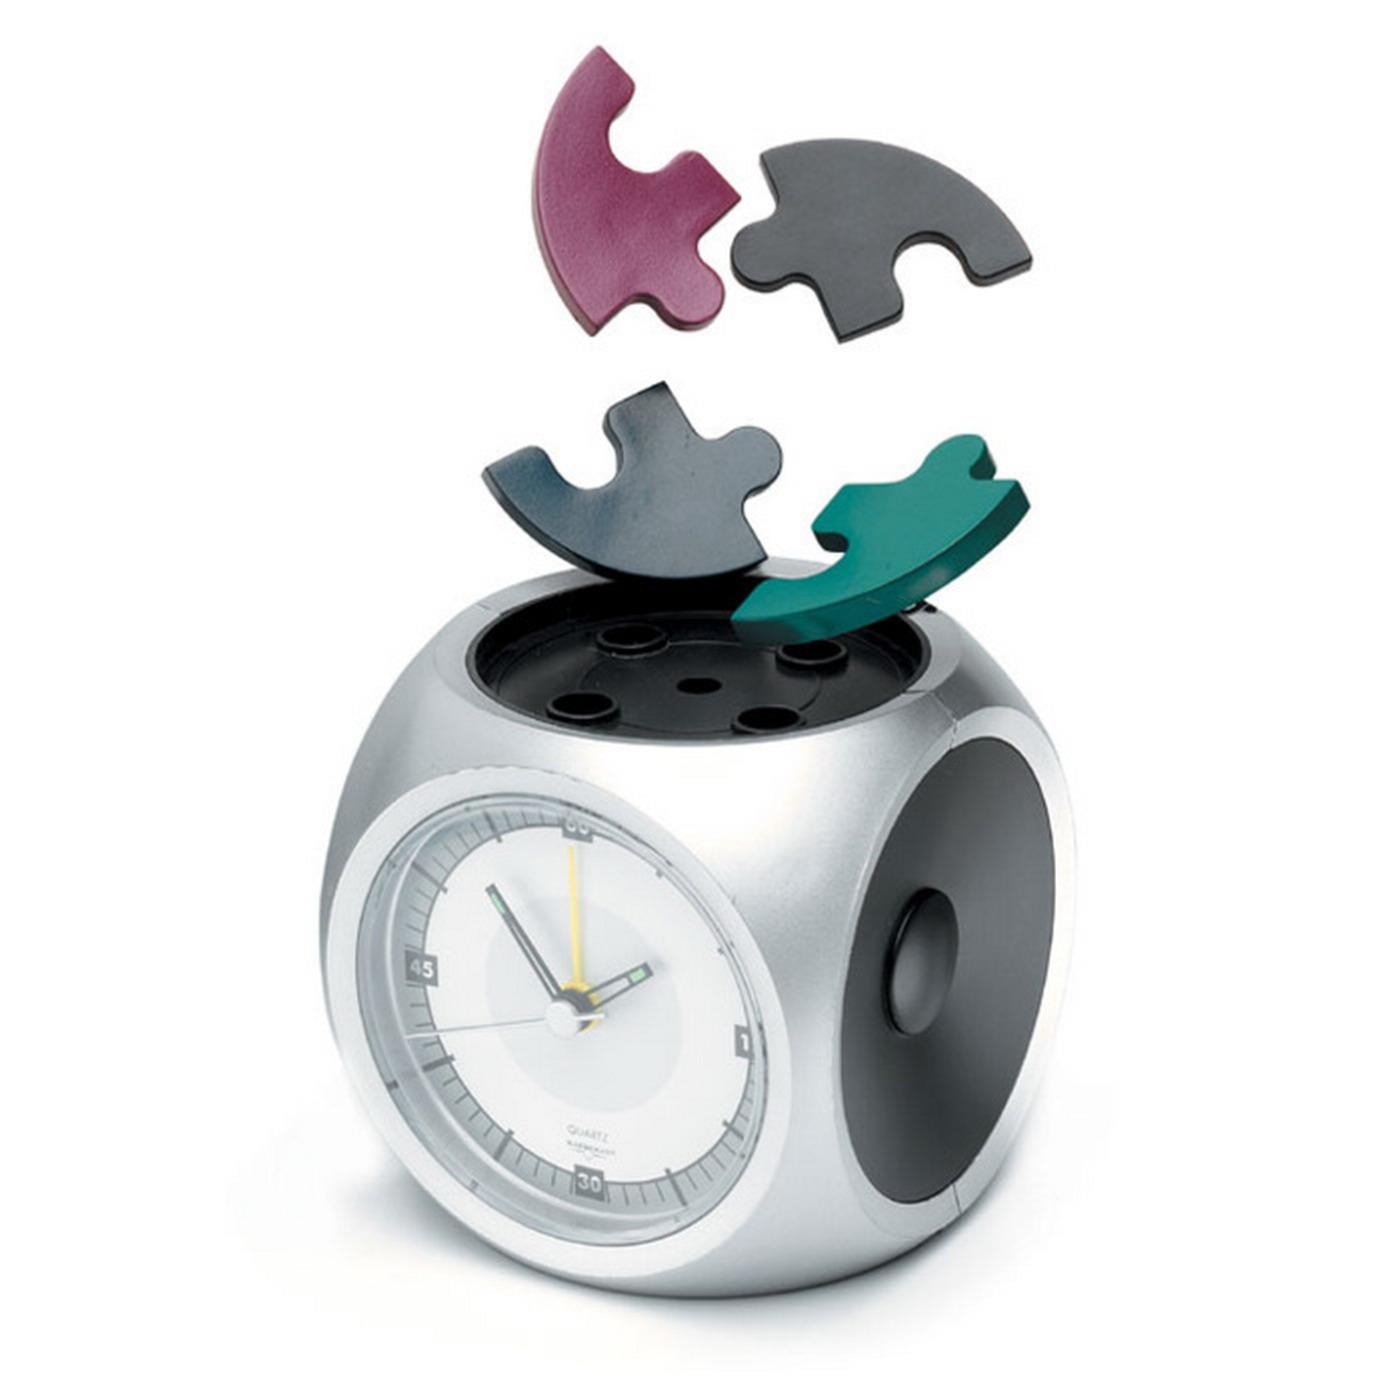 http://4.bp.blogspot.com/__ZSELbzEqO8/TLQrK5s-OHI/AAAAAAAAACw/Ewnar6EWVmU/s1600/puzzle+alarm.jpg